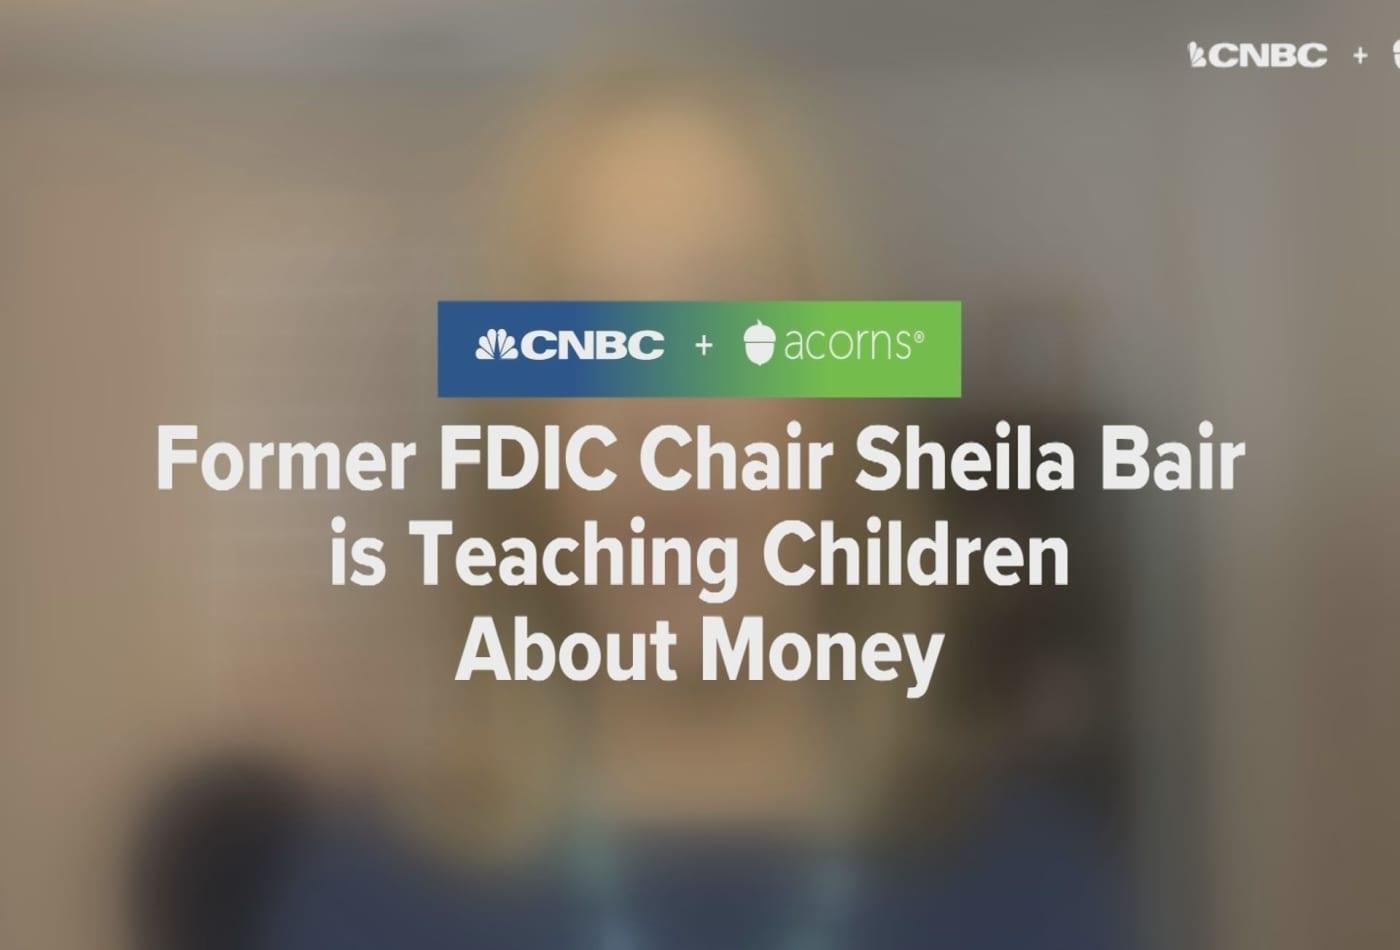 Former FDIC Chair Sheila Bair is teaching children about money